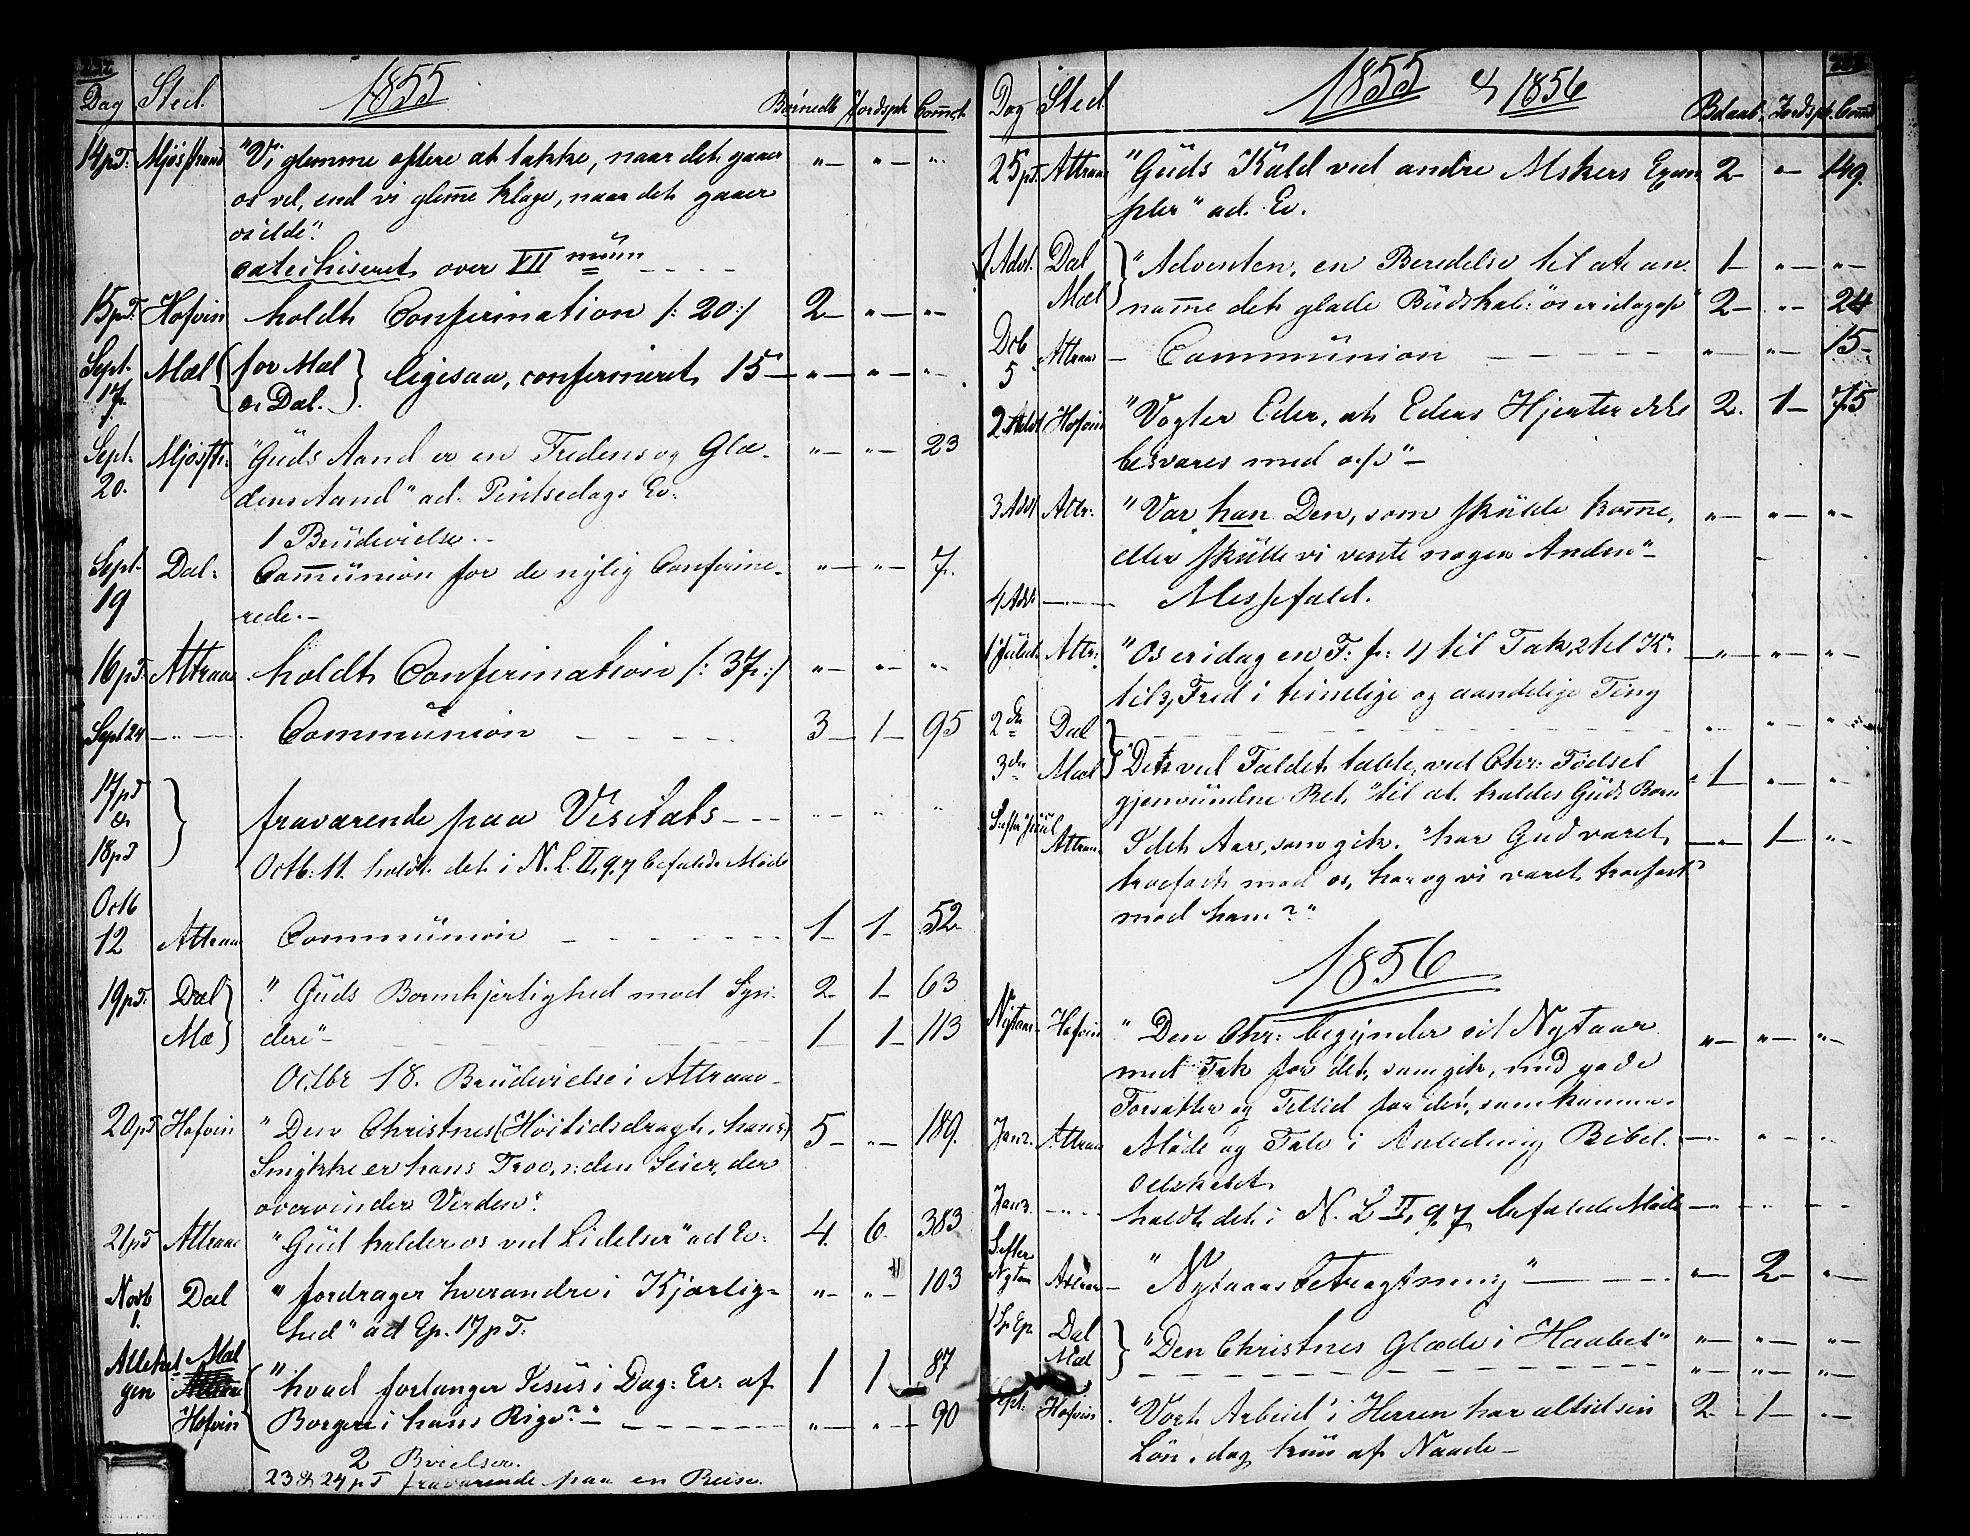 SAKO, Tinn kirkebøker, F/Fa/L0003: Ministerialbok nr. I 3, 1810-1814, s. 232-233